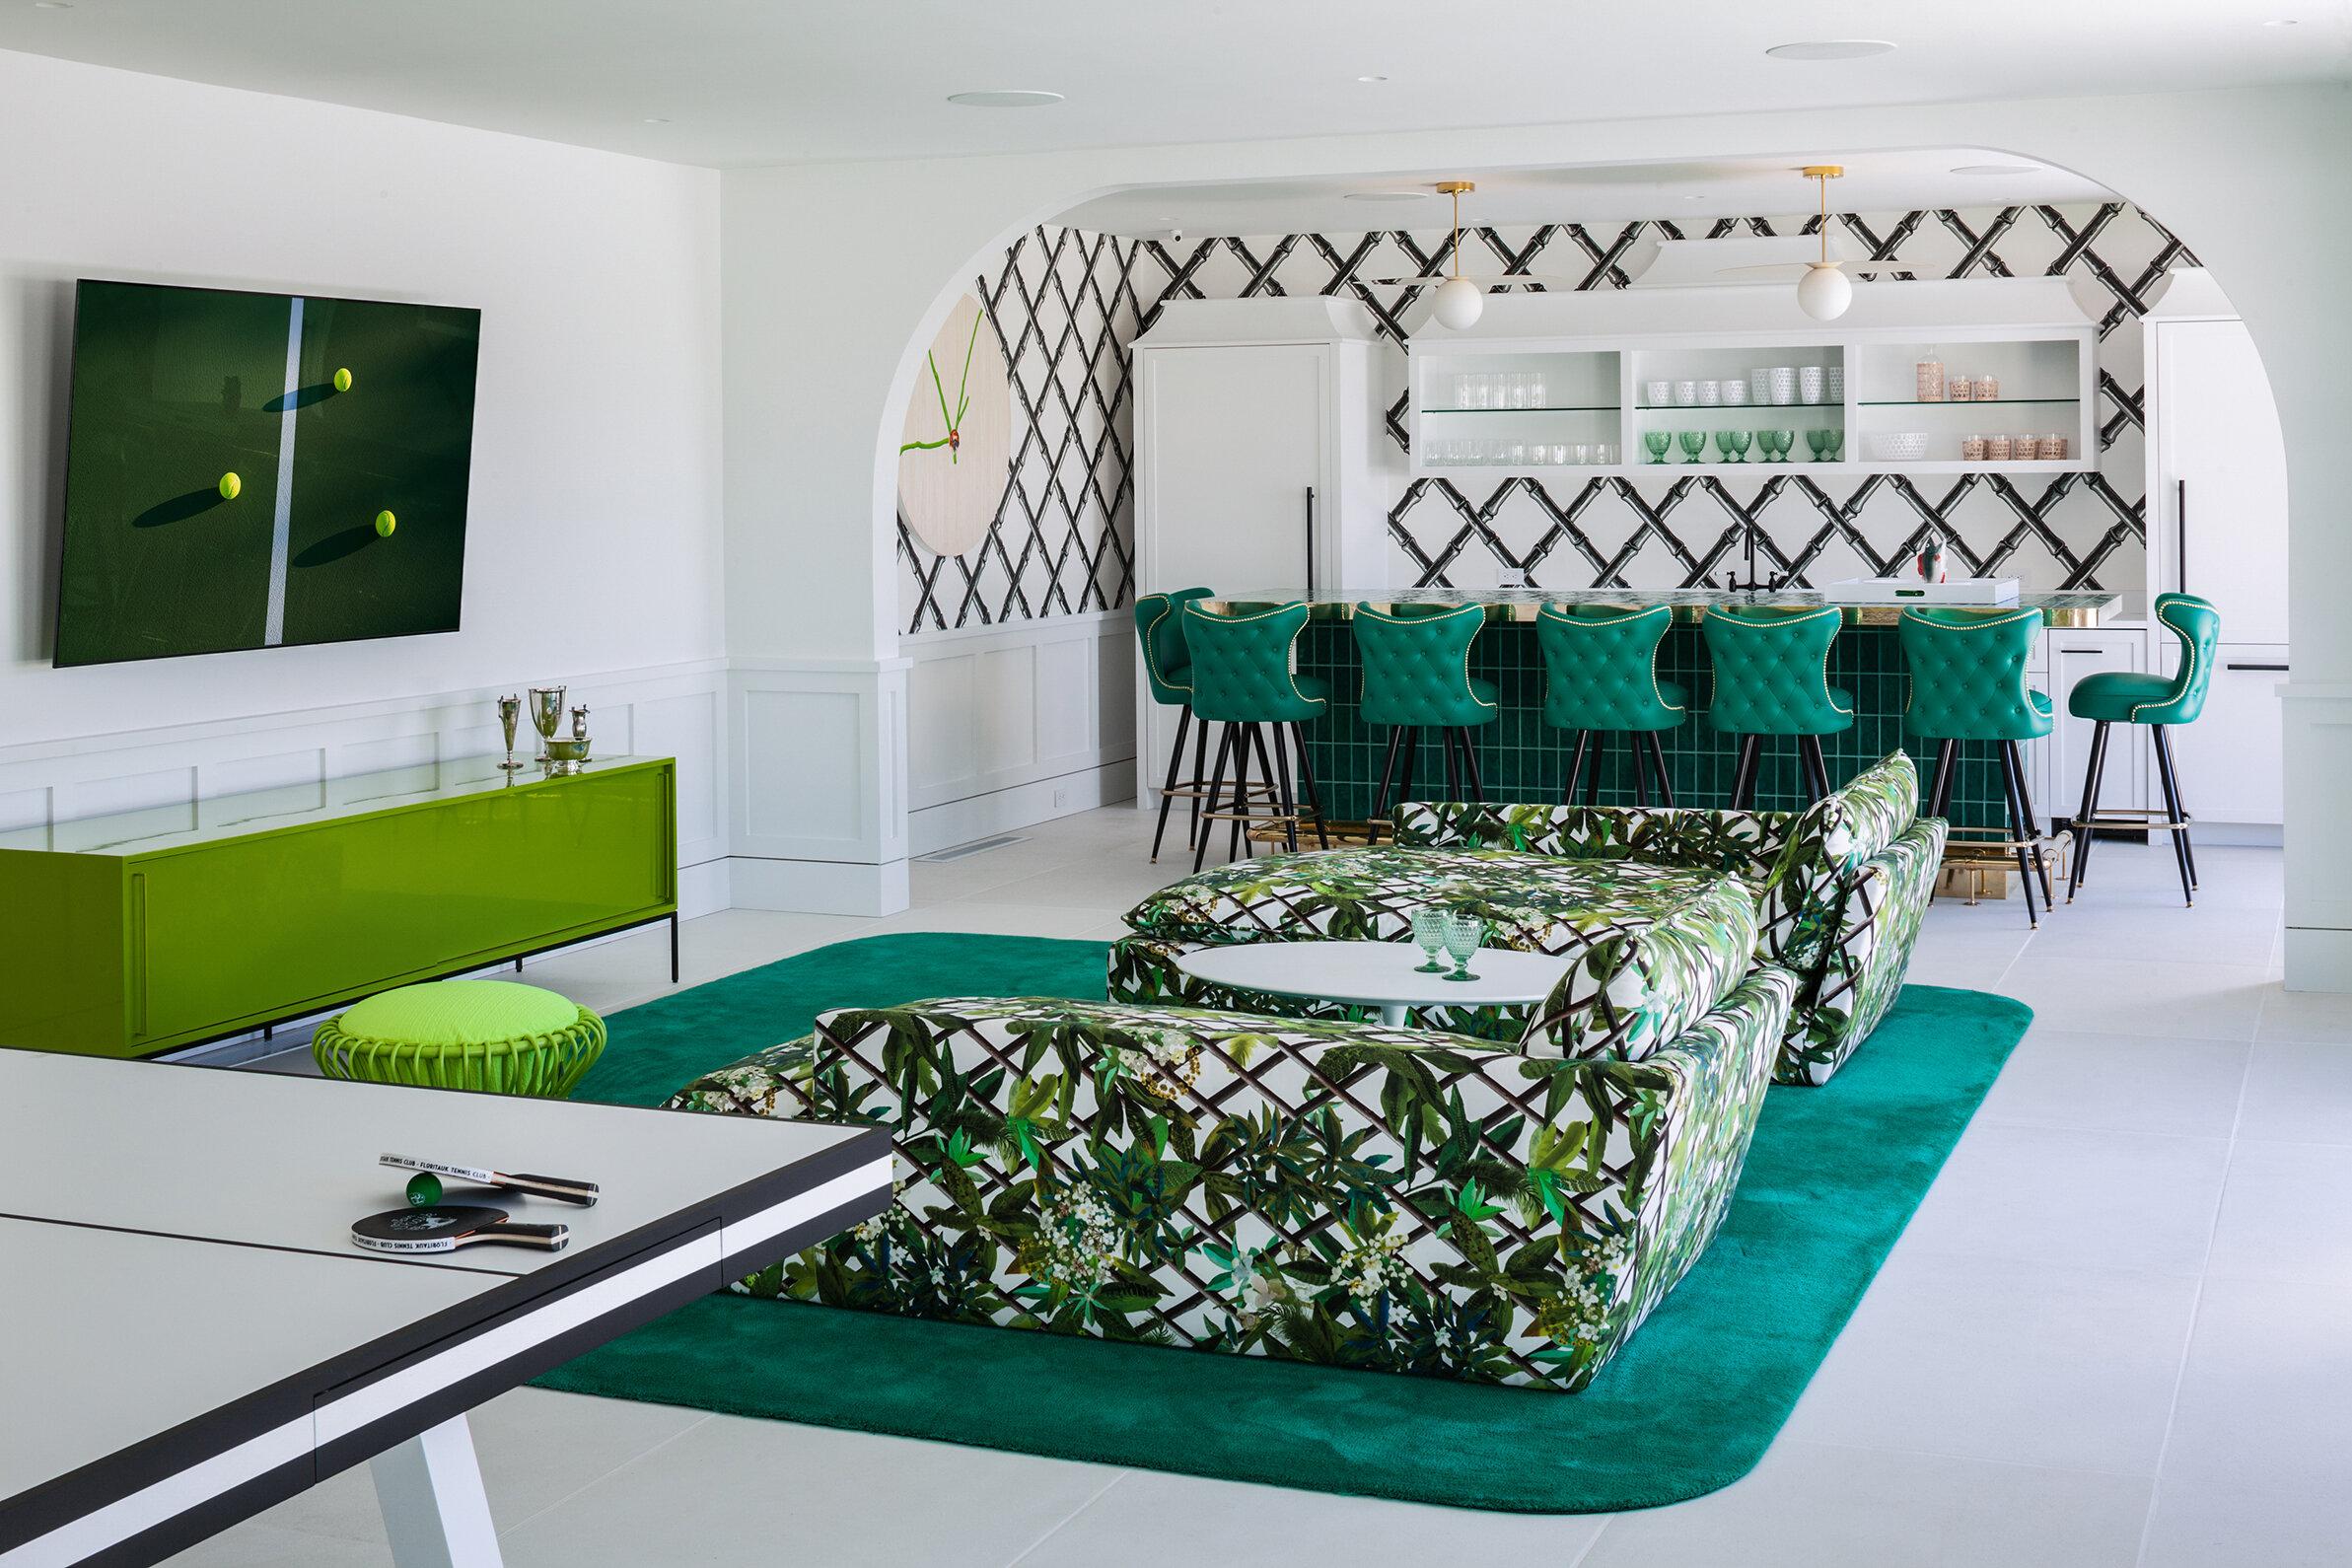 ©+ghislaine+vinas+interior+design_tennis-pavillion_4.jpg